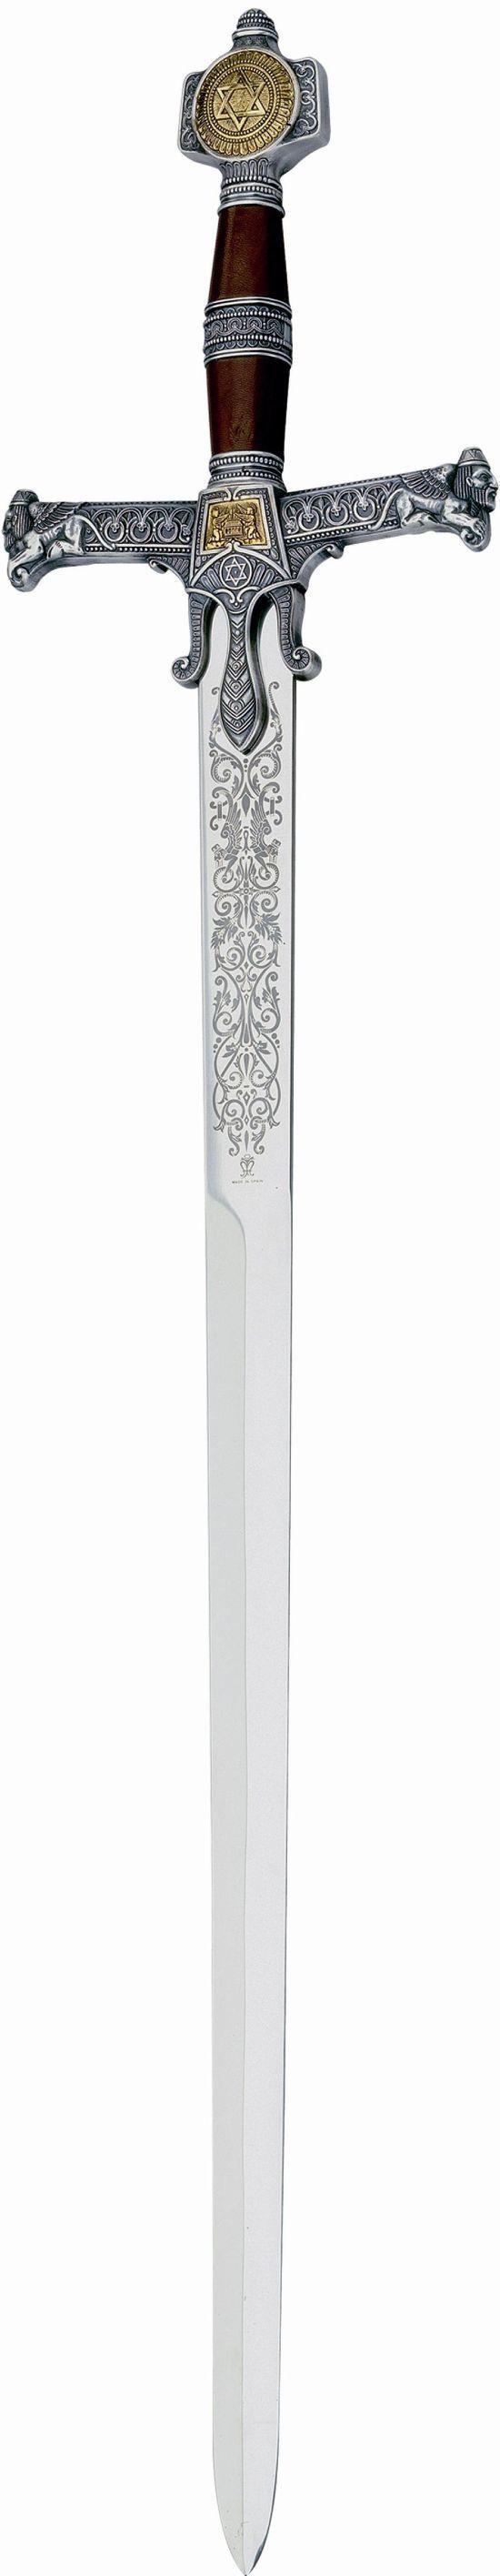 # RCMA586.2TS Silver King Solomon Sword by Marto of Toledo Spain